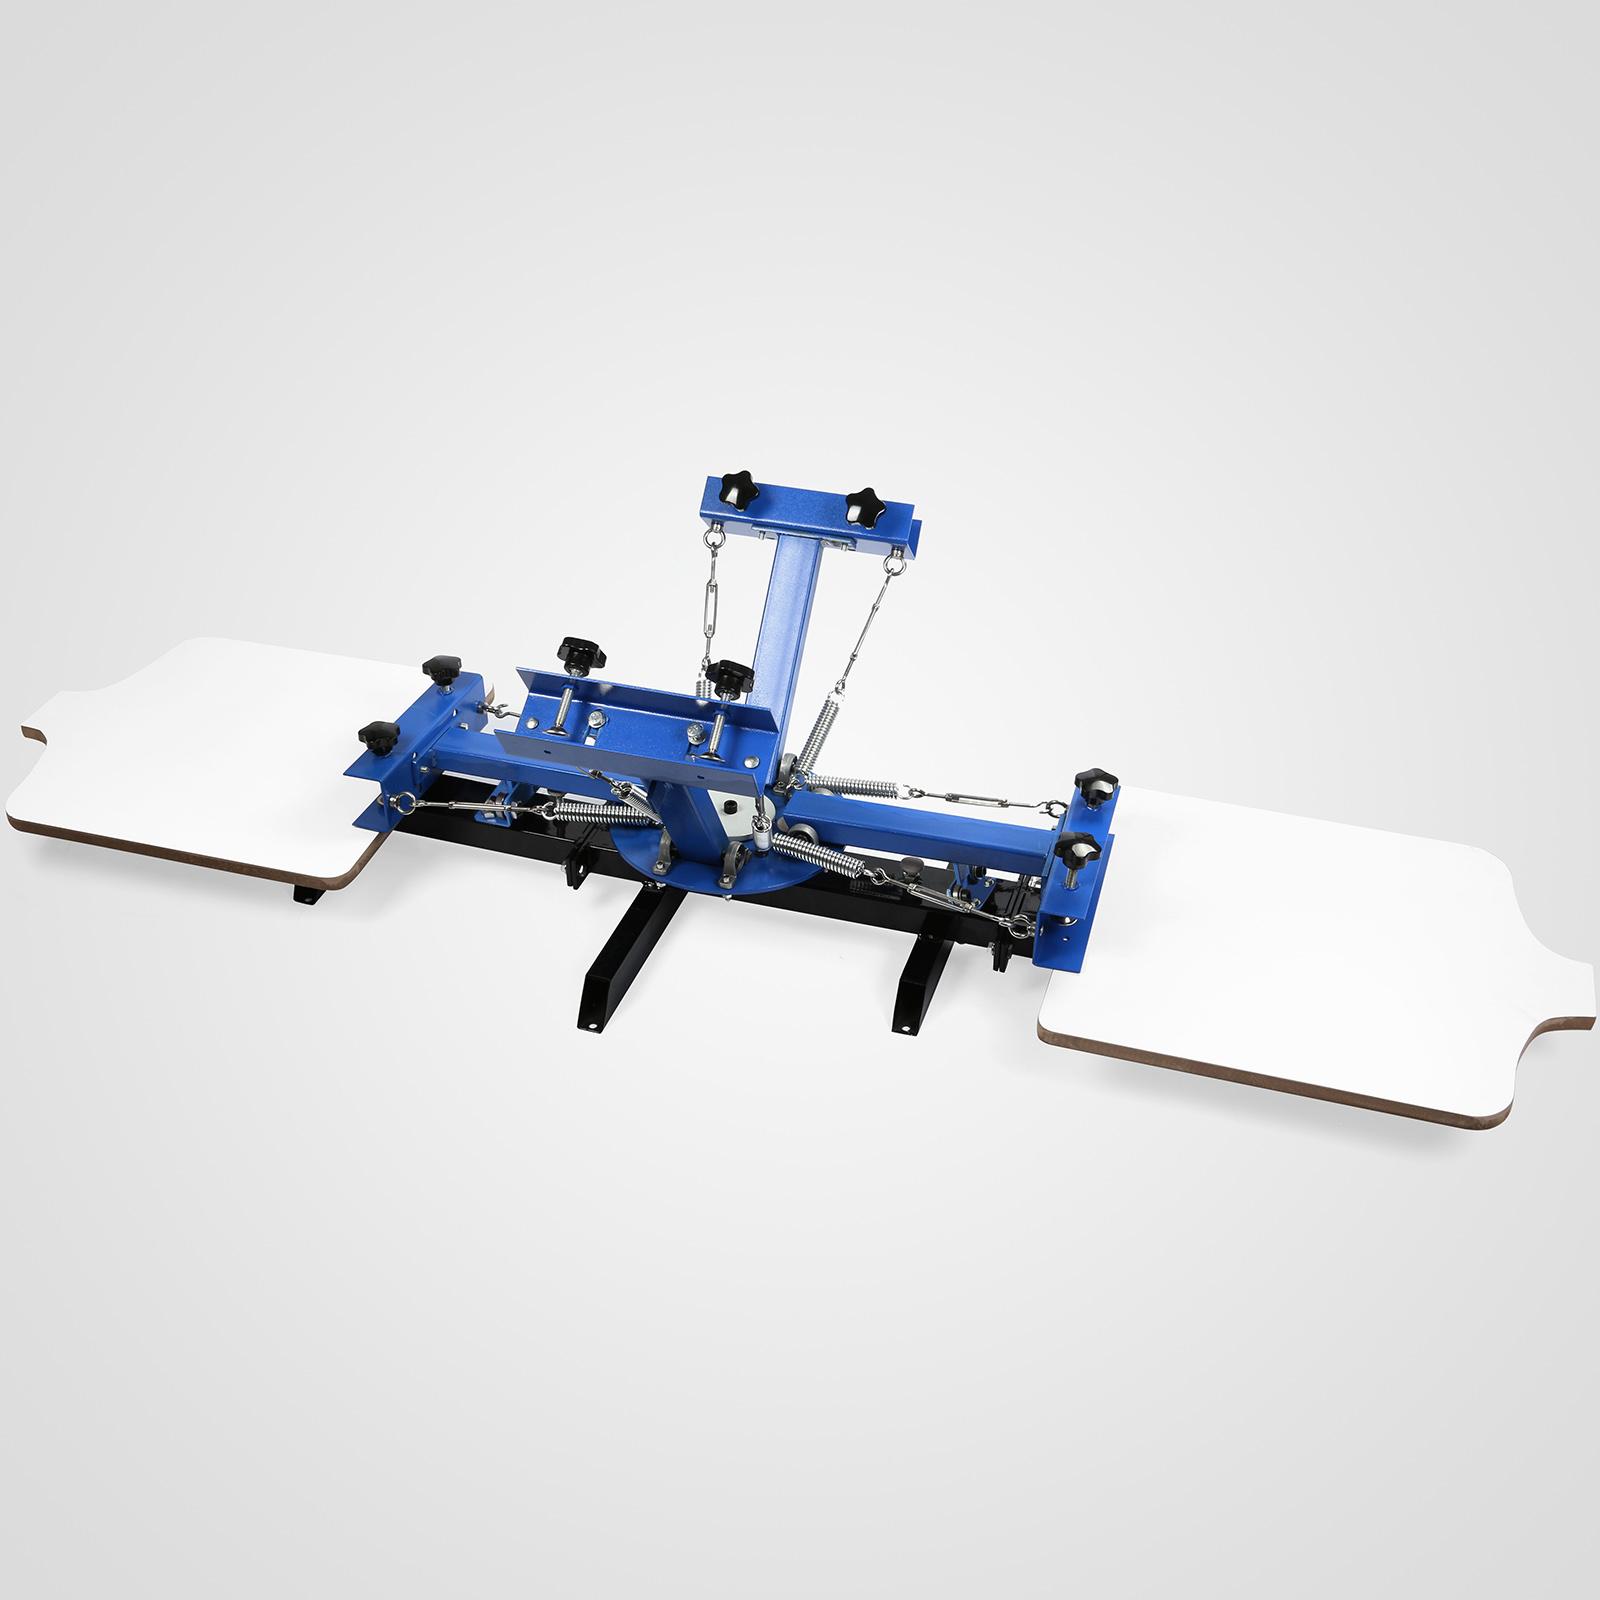 diy presse machine de s rigraphie table presse chaud ebay. Black Bedroom Furniture Sets. Home Design Ideas